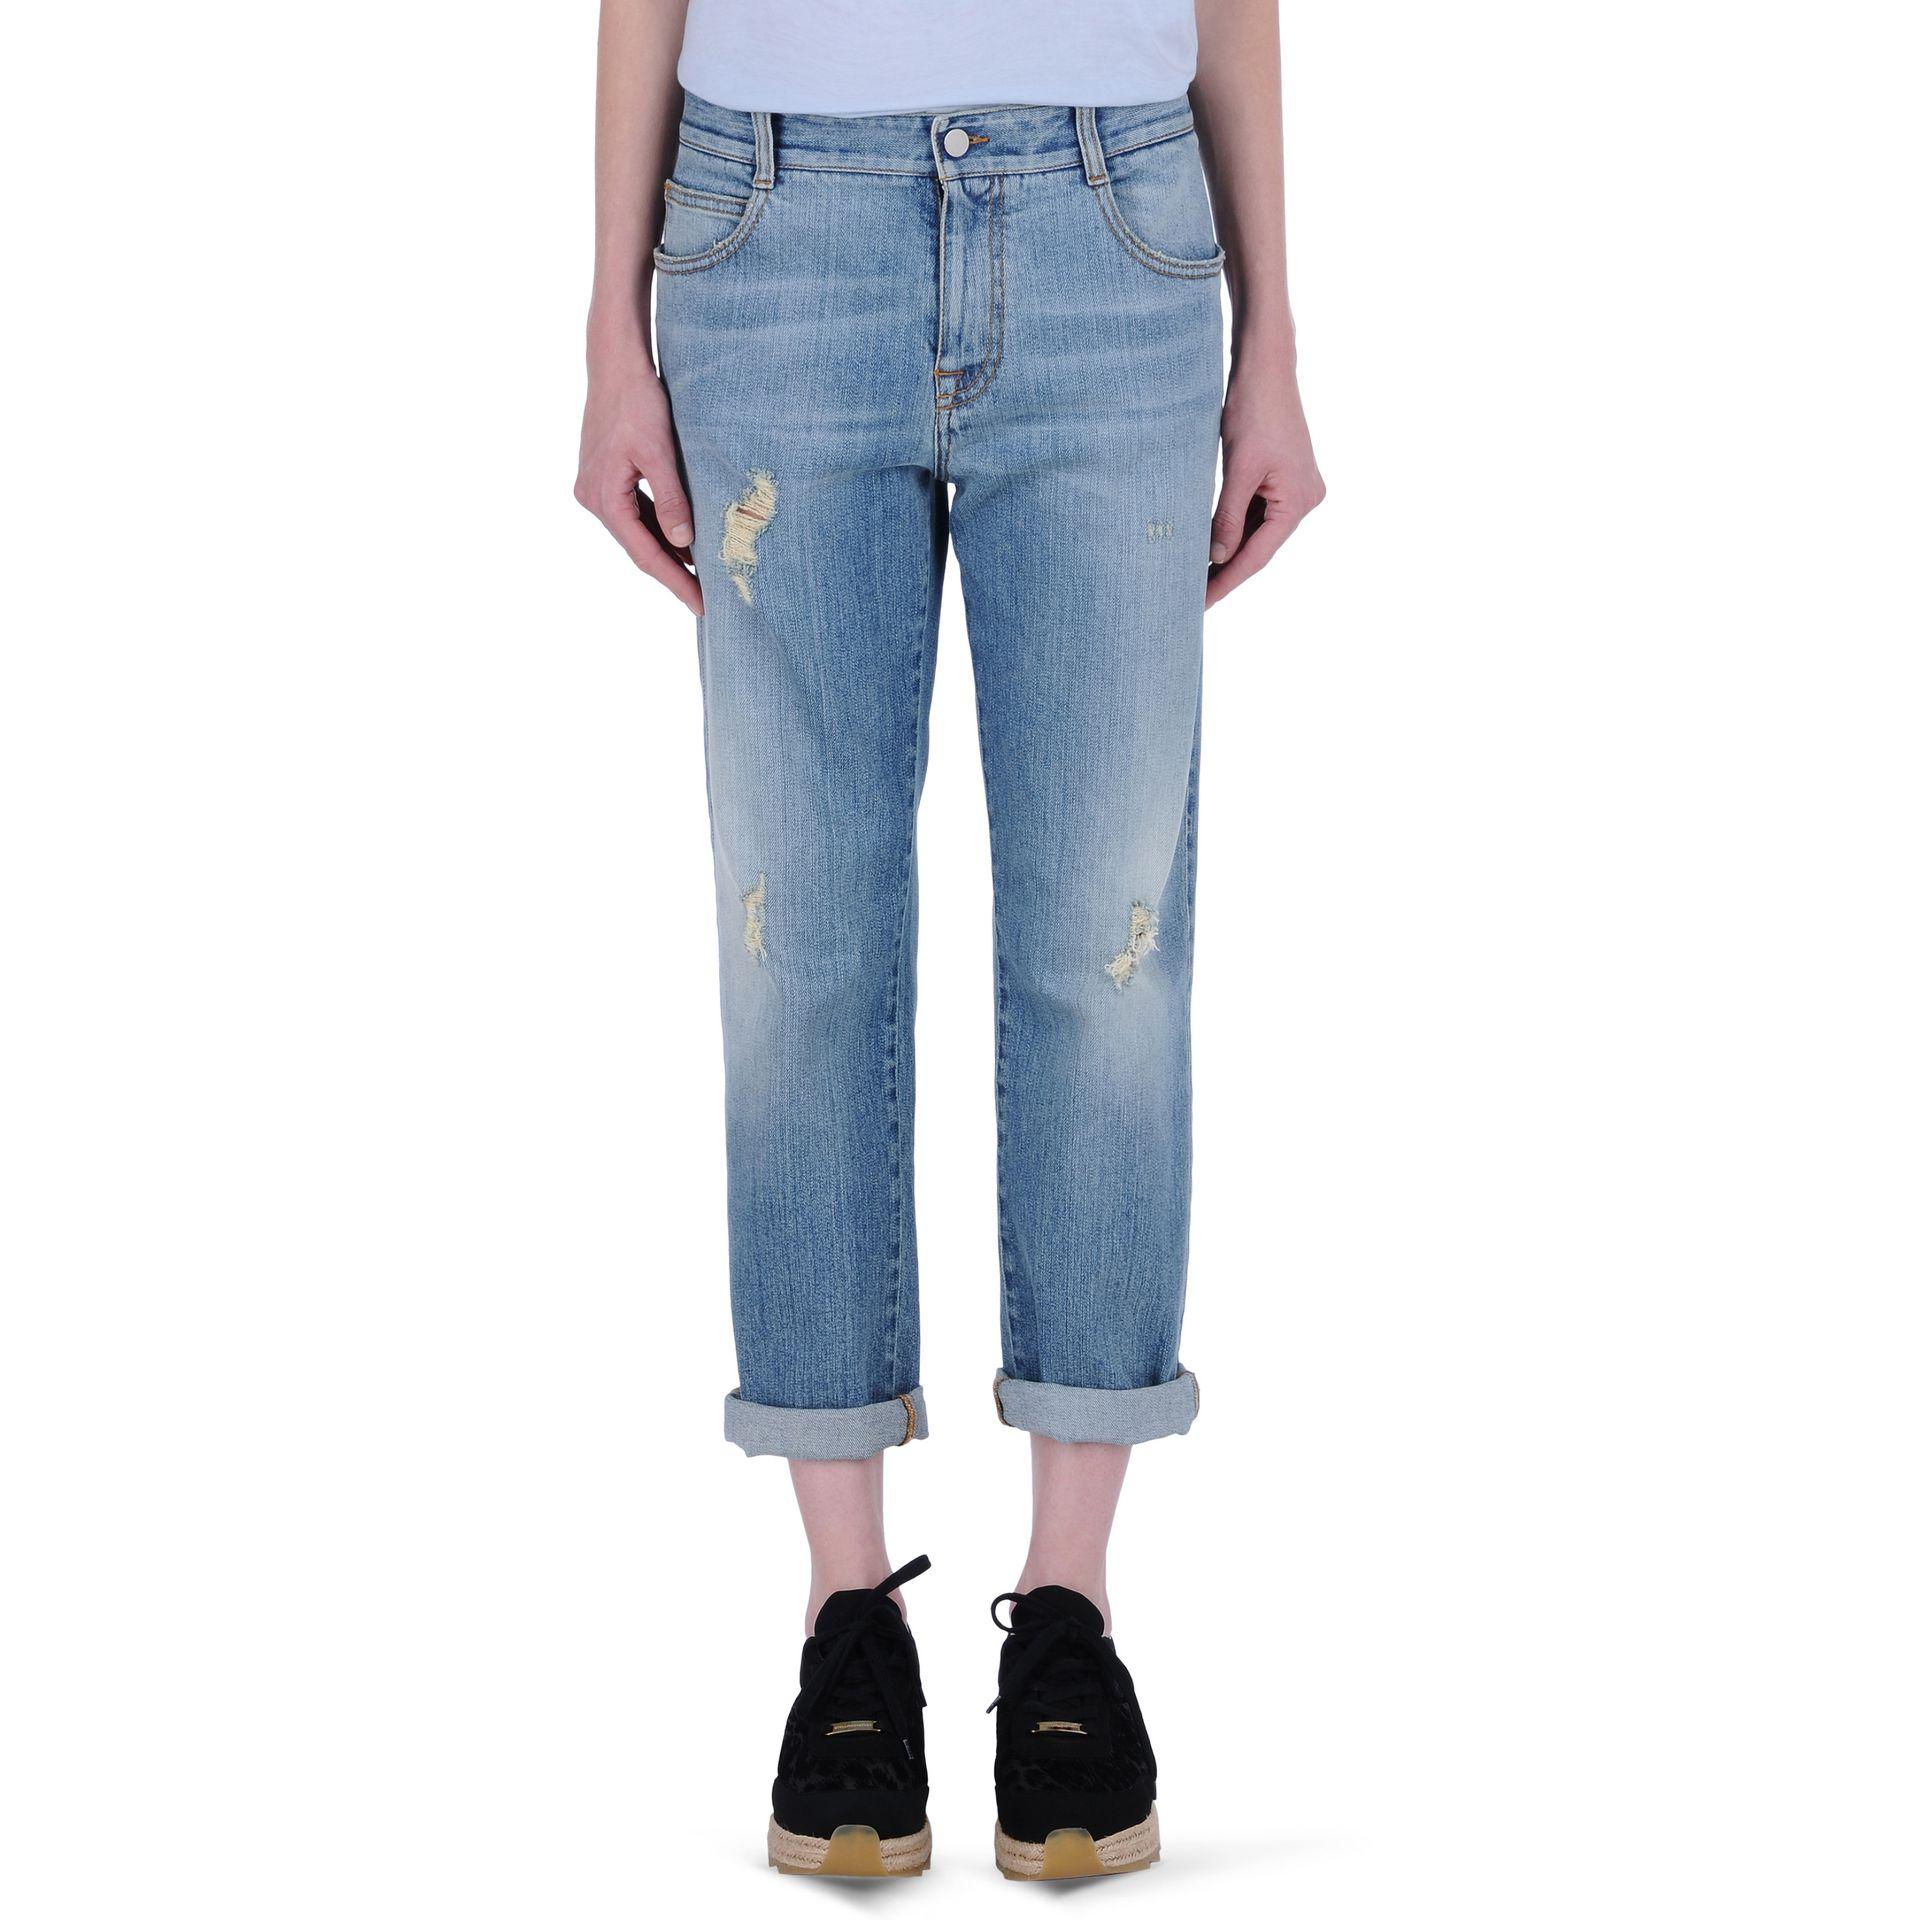 Resultado de imagem para stella mccartney tomboy jeans